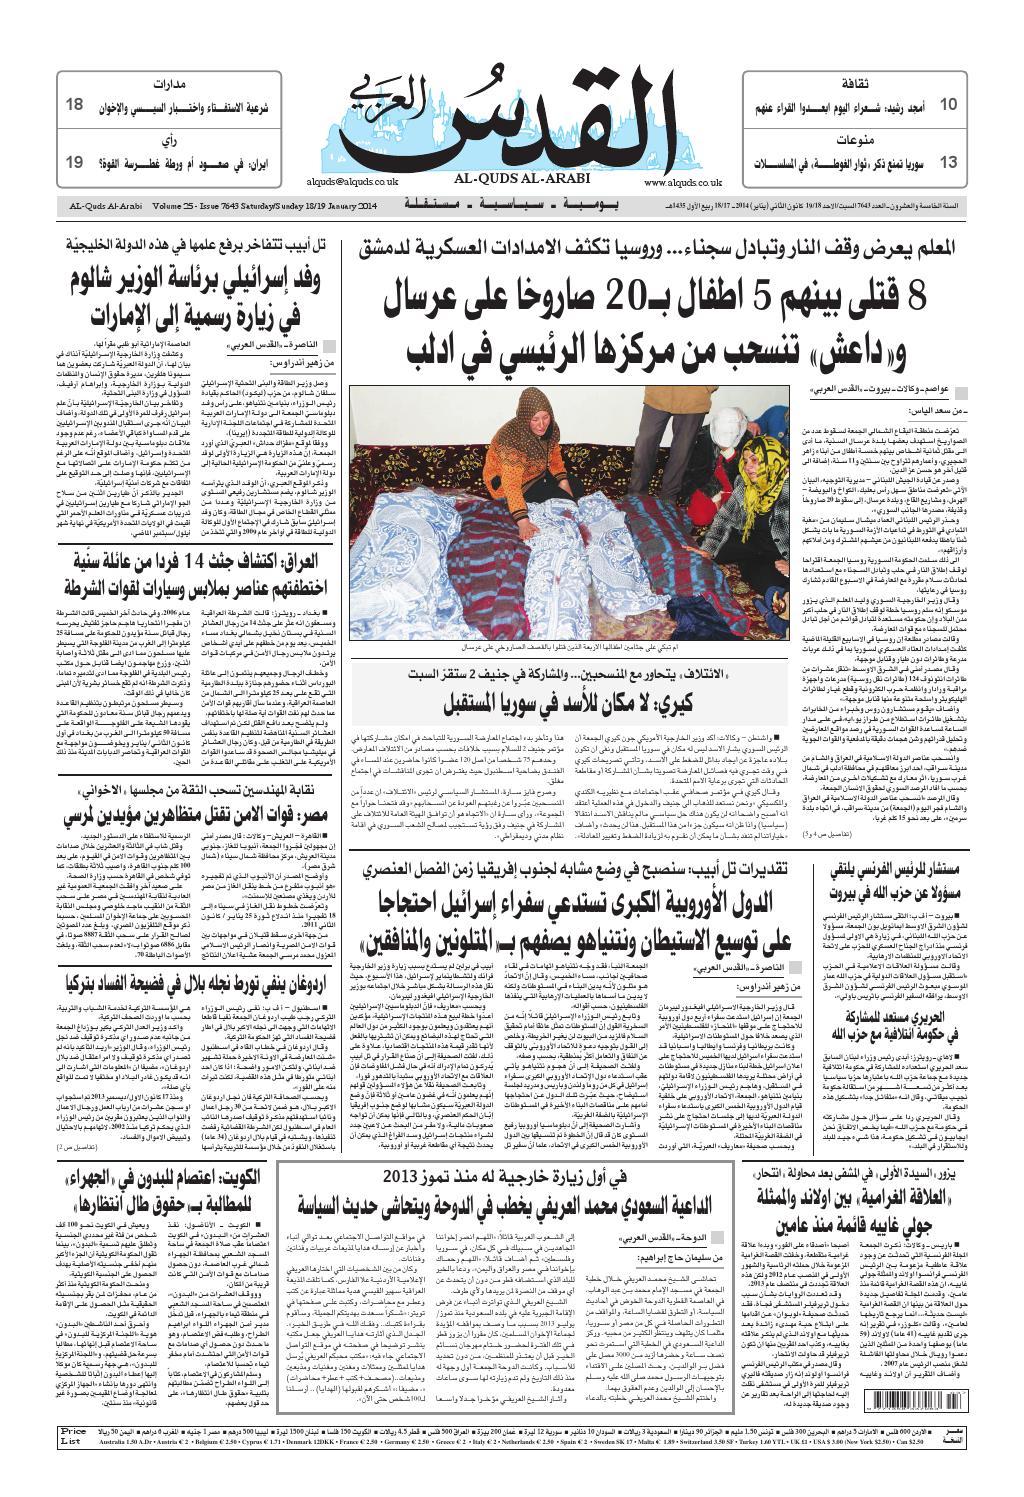 48b850aa7 صحيفة القدس العربي , السبت والأحد 18/19.01.2014 by مركز الحدث - issuu